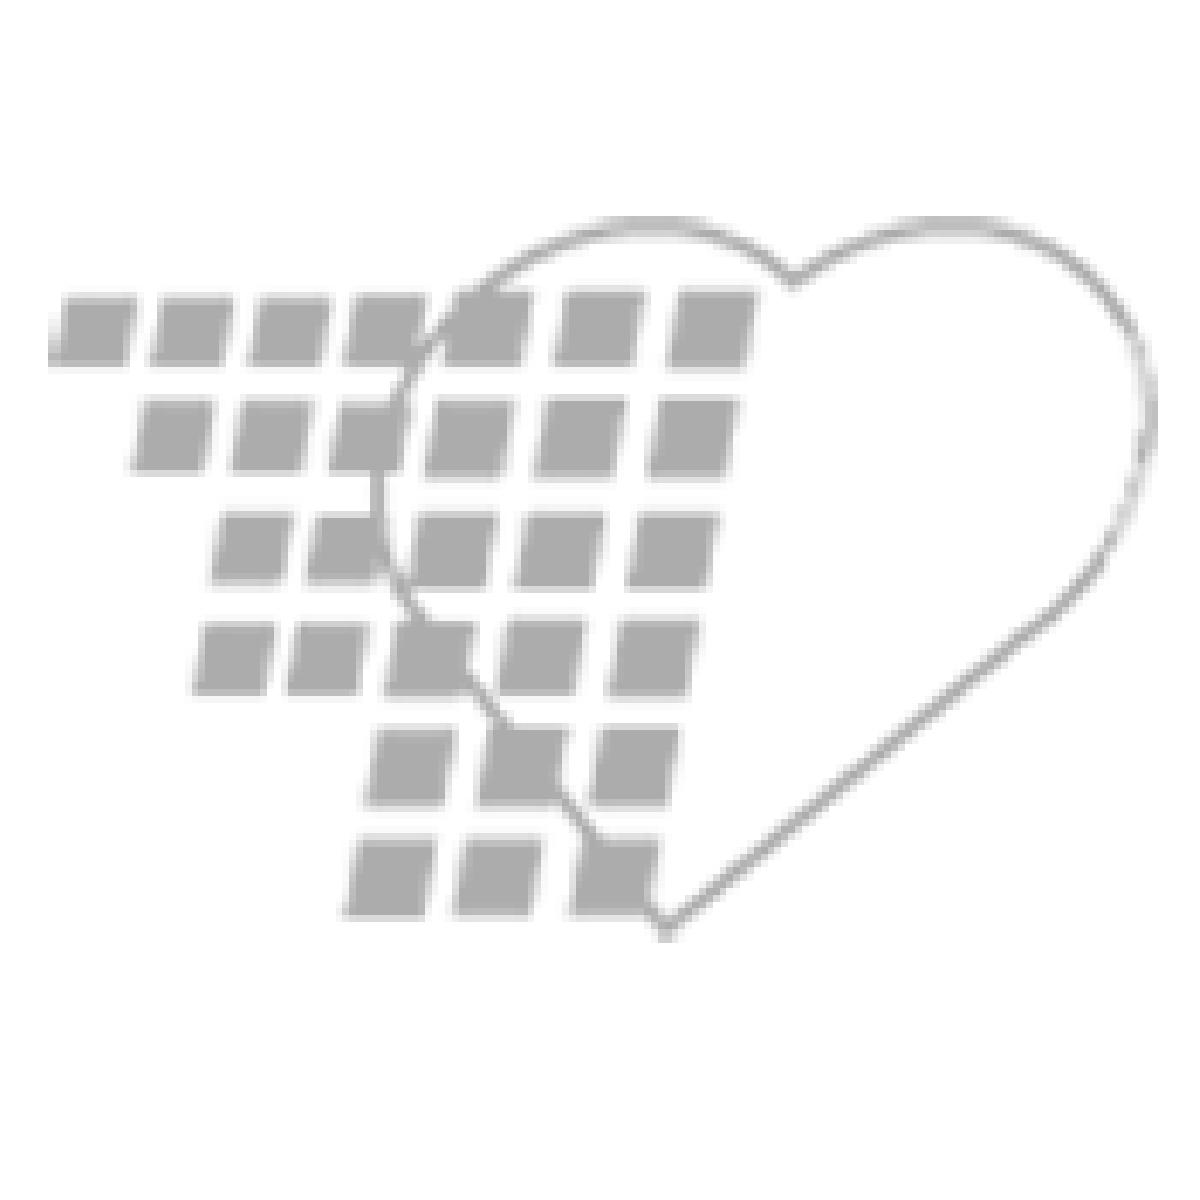 09-79-2000 Nasco Chronic Care Challenges™ - Simulation Glasses